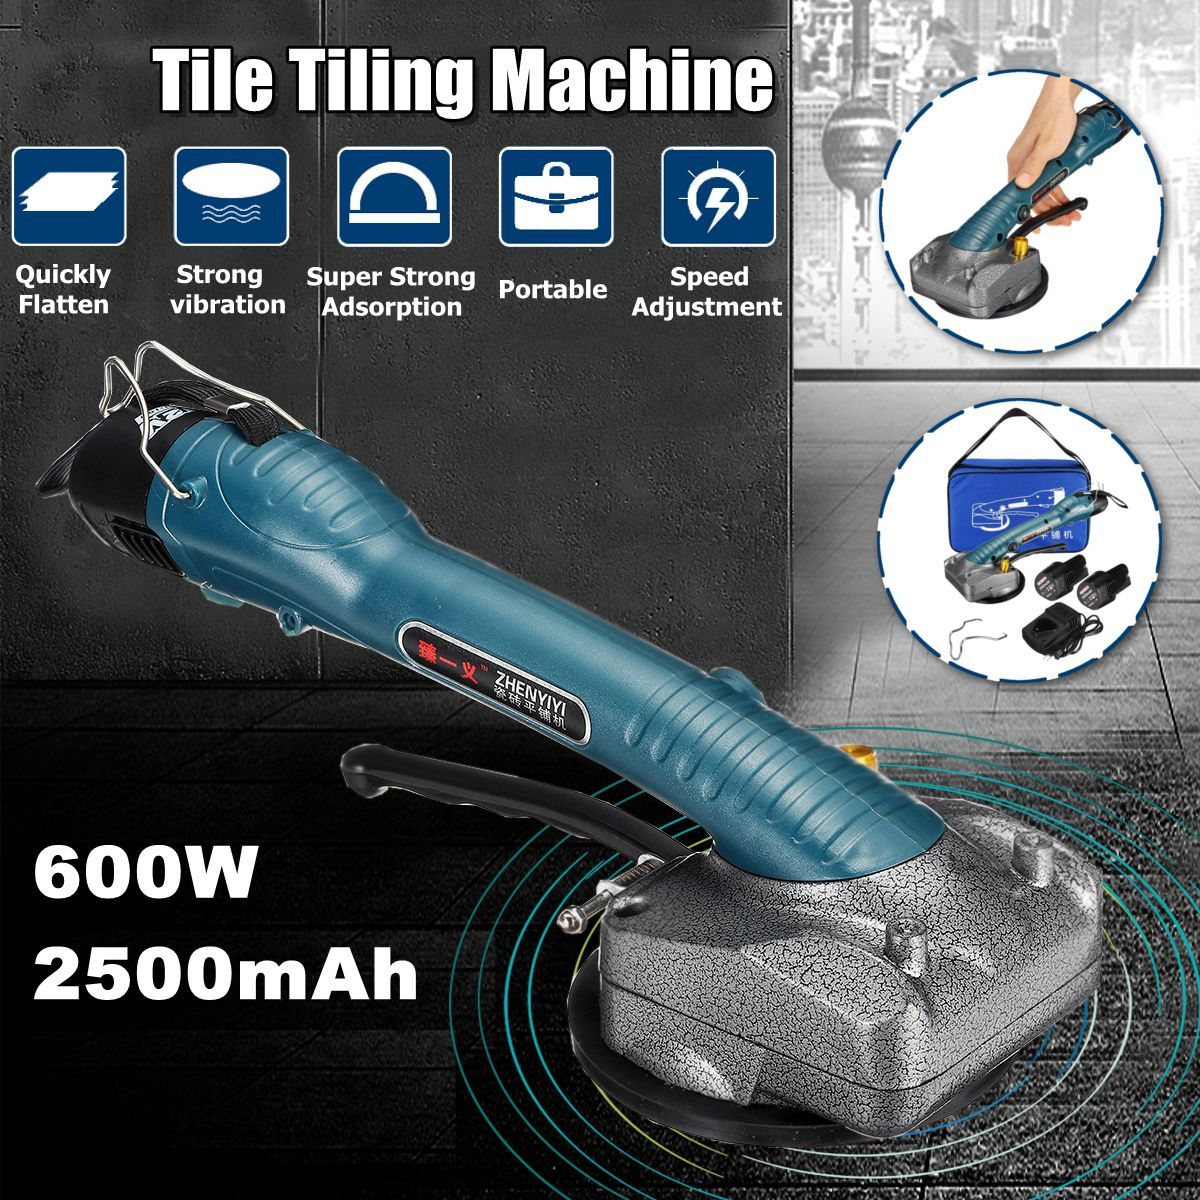 600W Tile Machine Vibrators High Power Tile Tiling Machine Electric Floor Tile Vibrator Tiling Tile Tool + 2x2500mAhBatteries